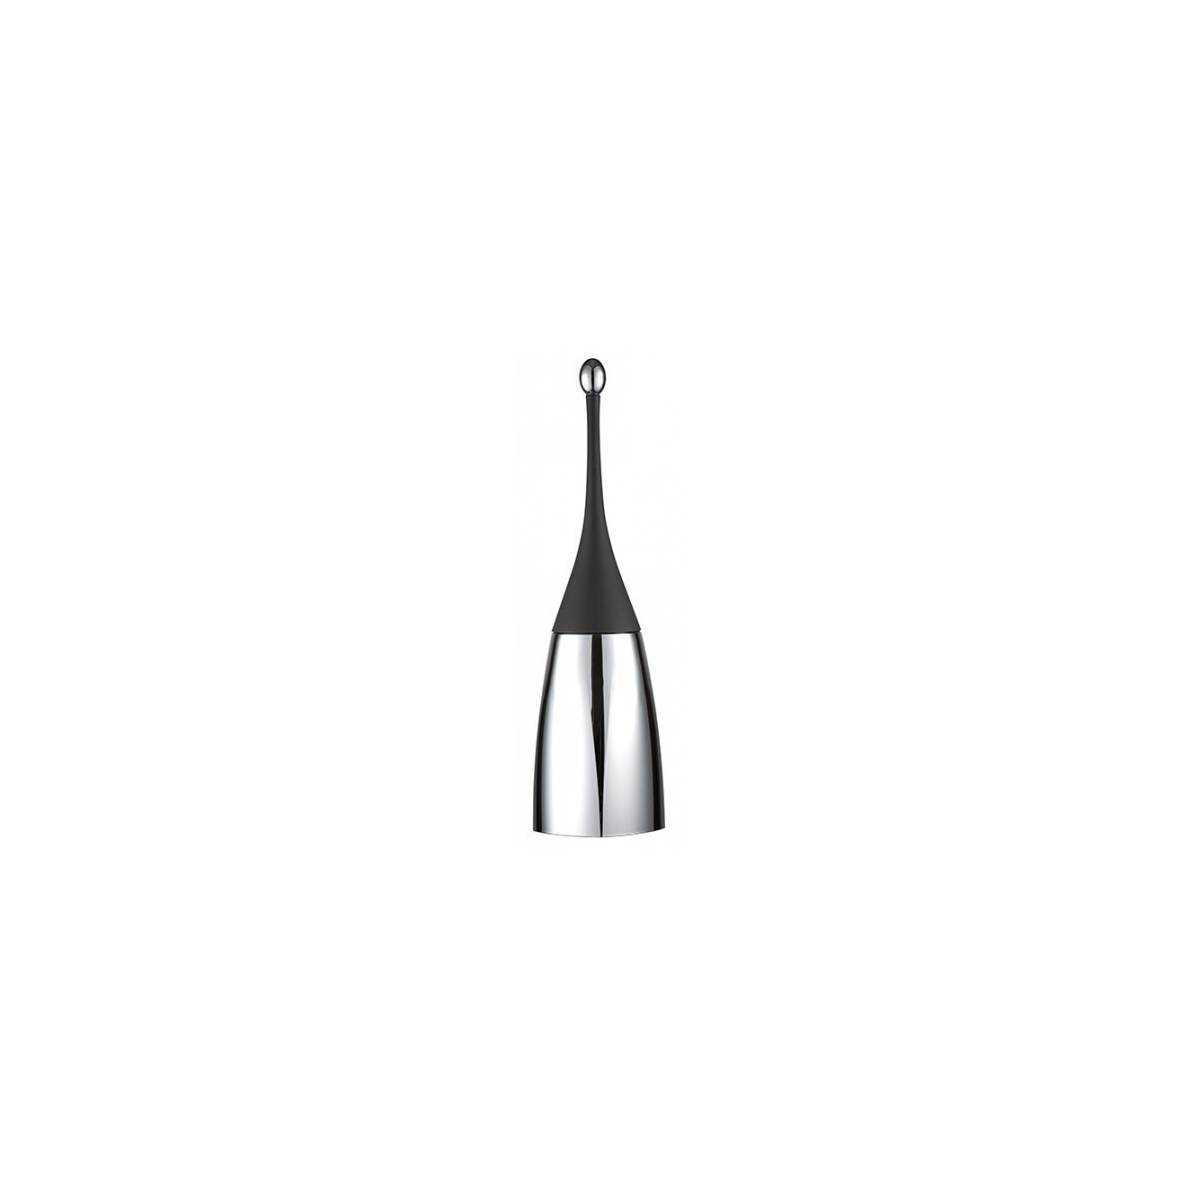 Щетка для унитаза напольная COLORED (654NE) 654NE Mar Plast